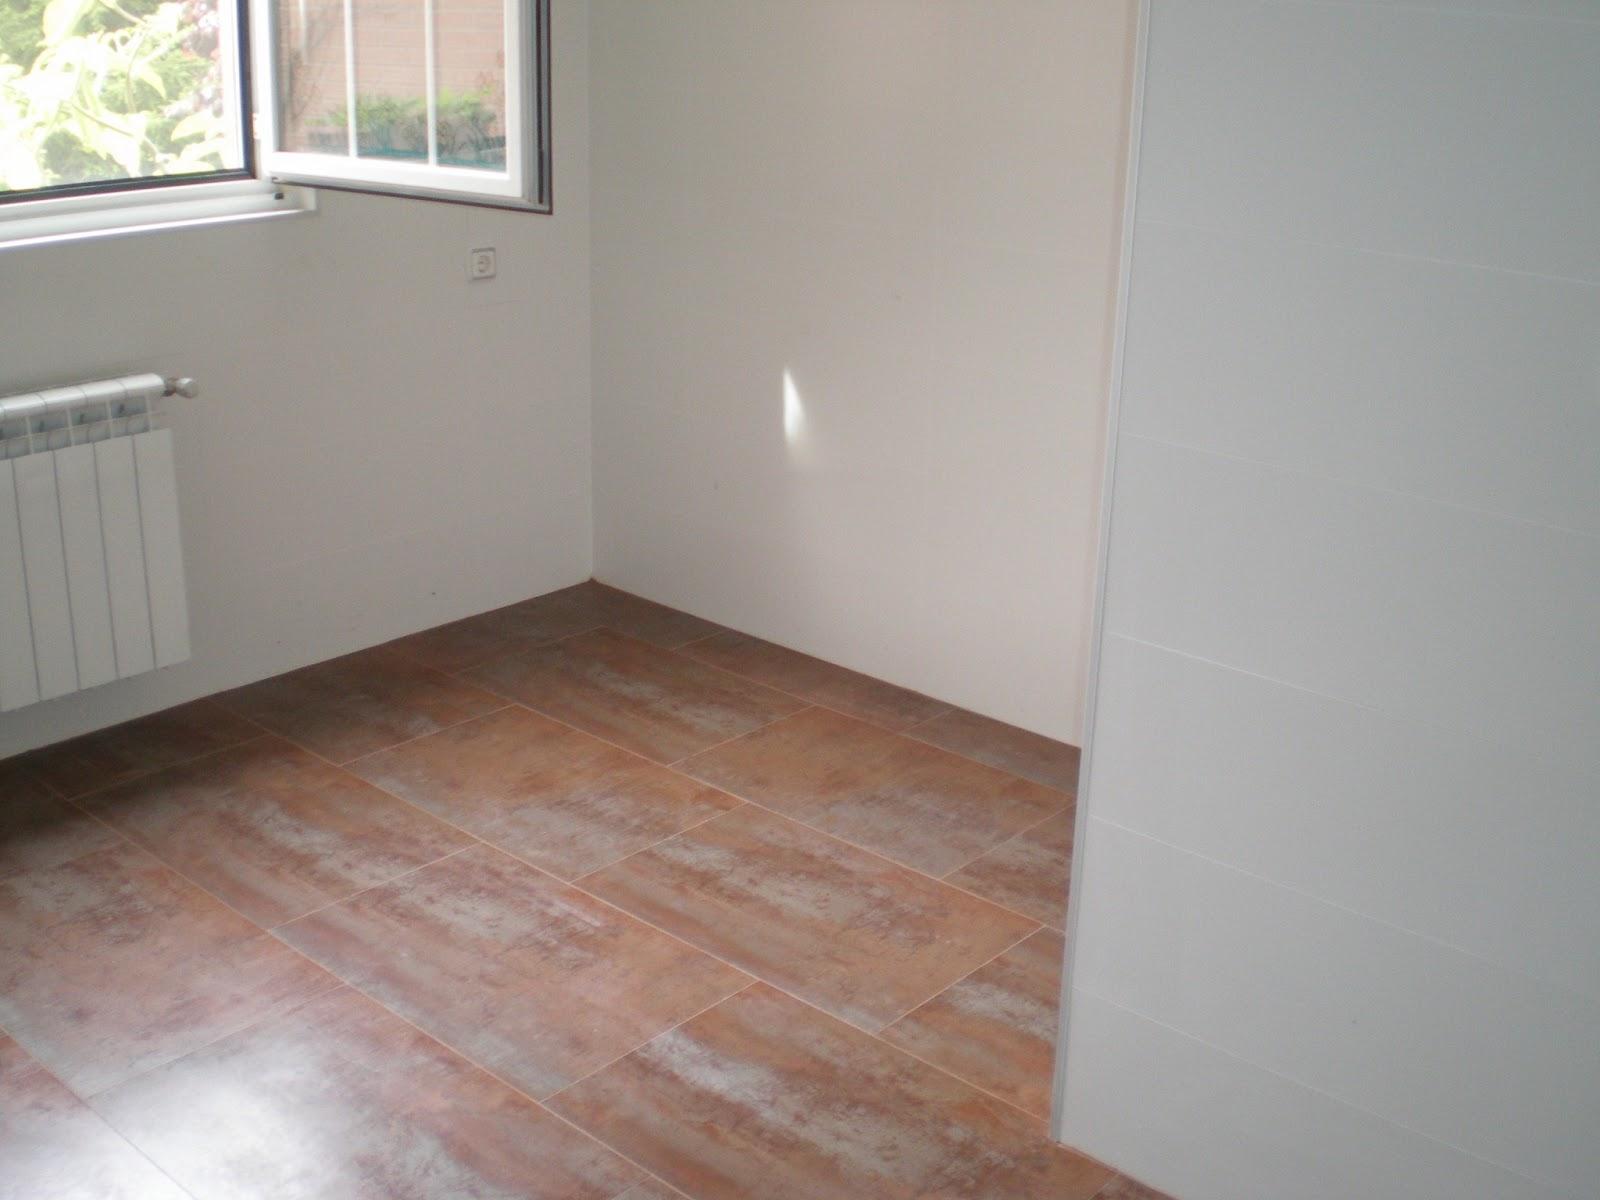 hausfrau renovierung unseres hauses vii die k che 14 tag. Black Bedroom Furniture Sets. Home Design Ideas